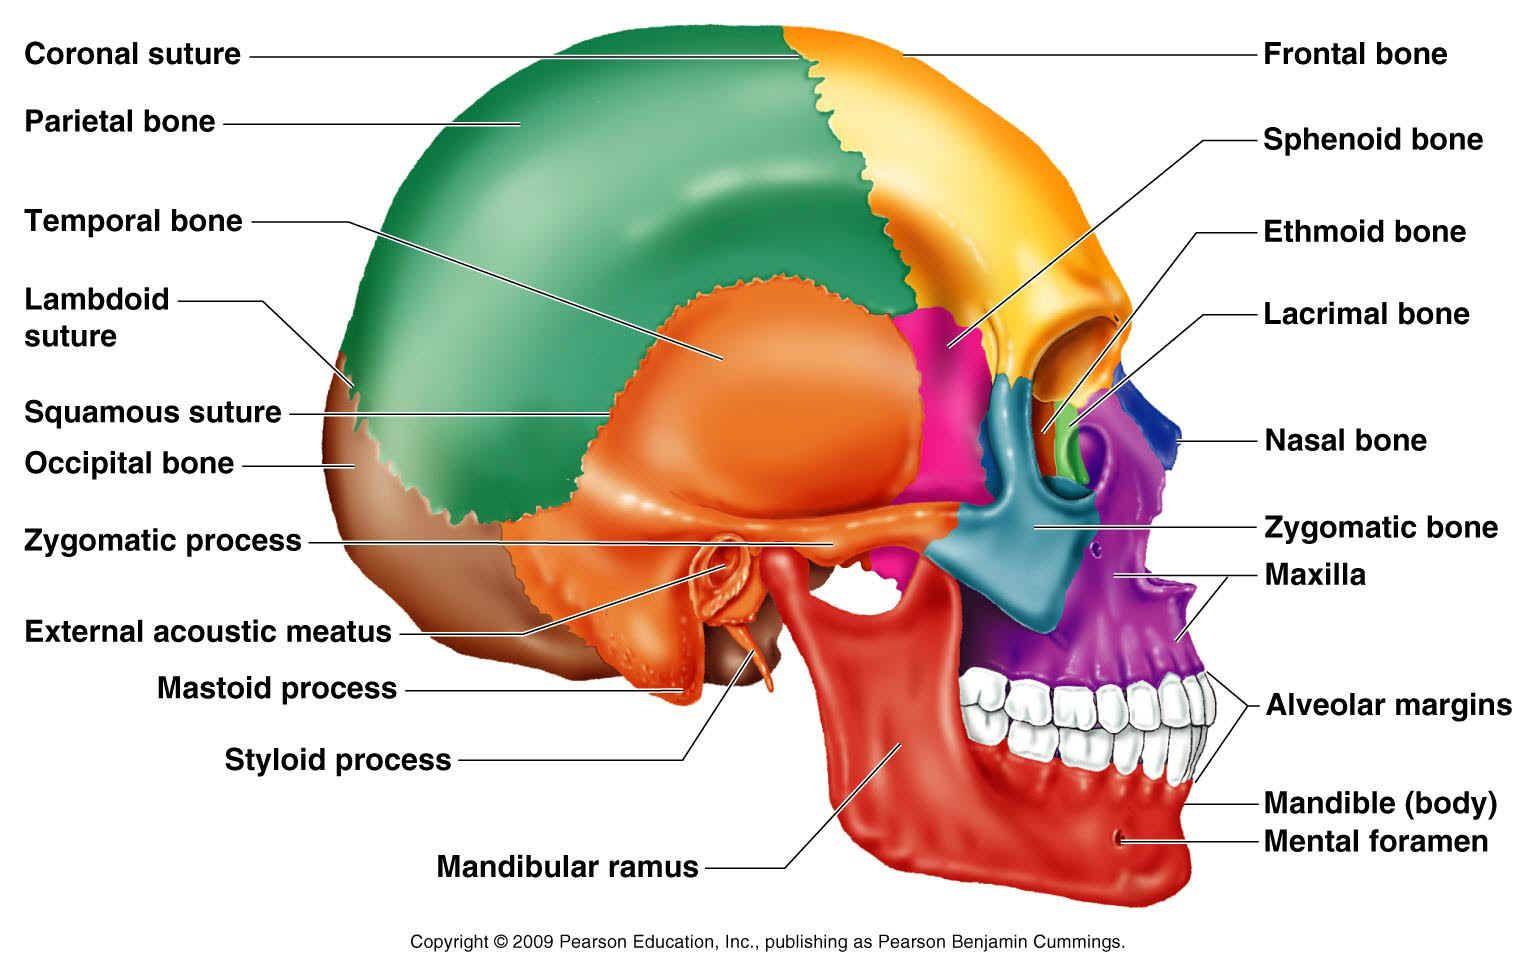 human anatomy pearson blank skull anatomy of the skull bones 1000 ideas about facial bones [ 1536 x 974 Pixel ]